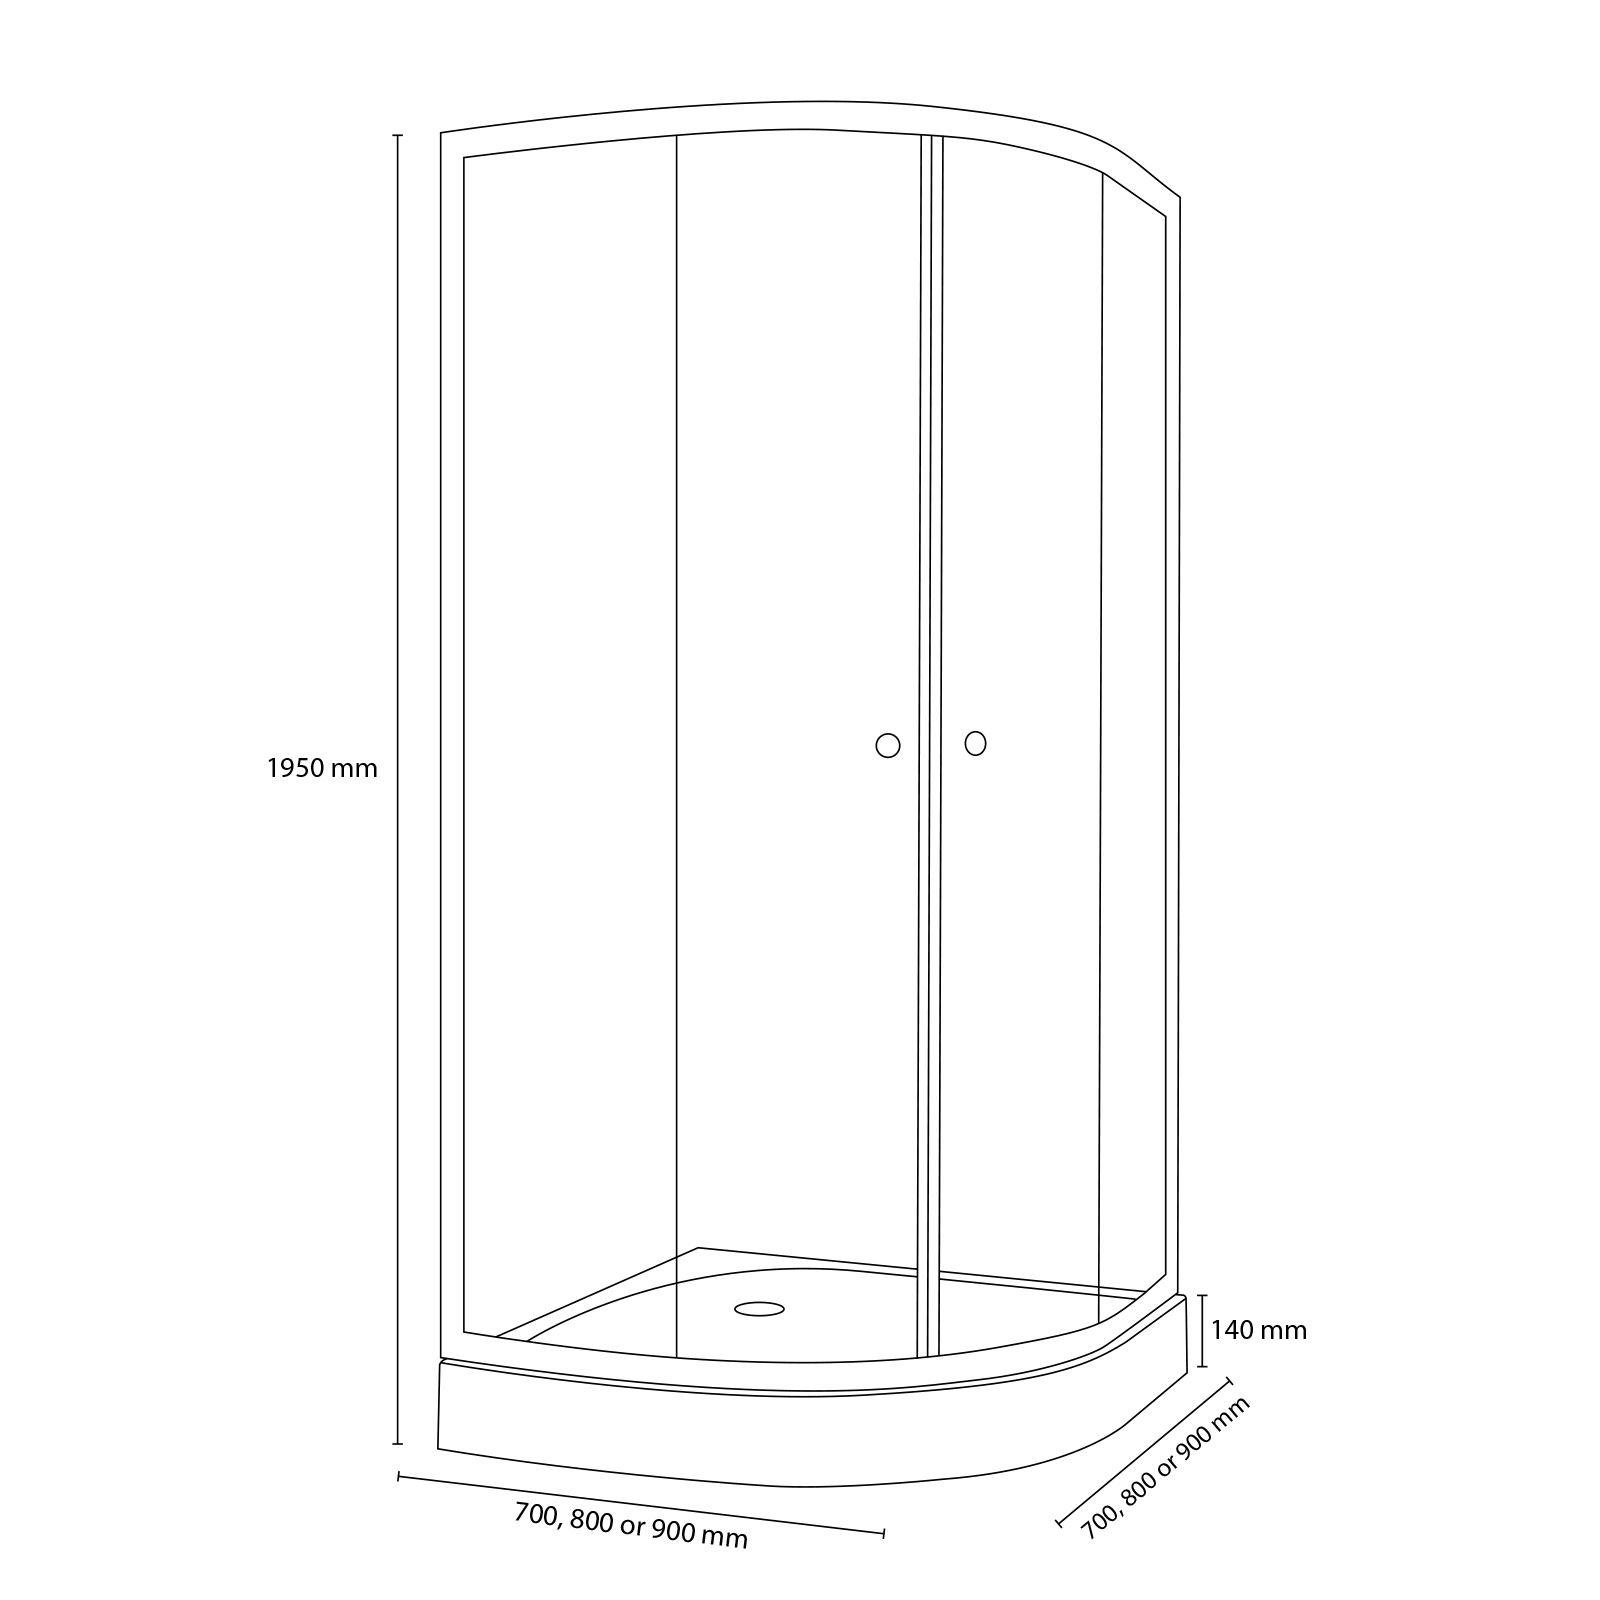 Quadrant Shower Enclosure White Or Silver 700 800 900mm